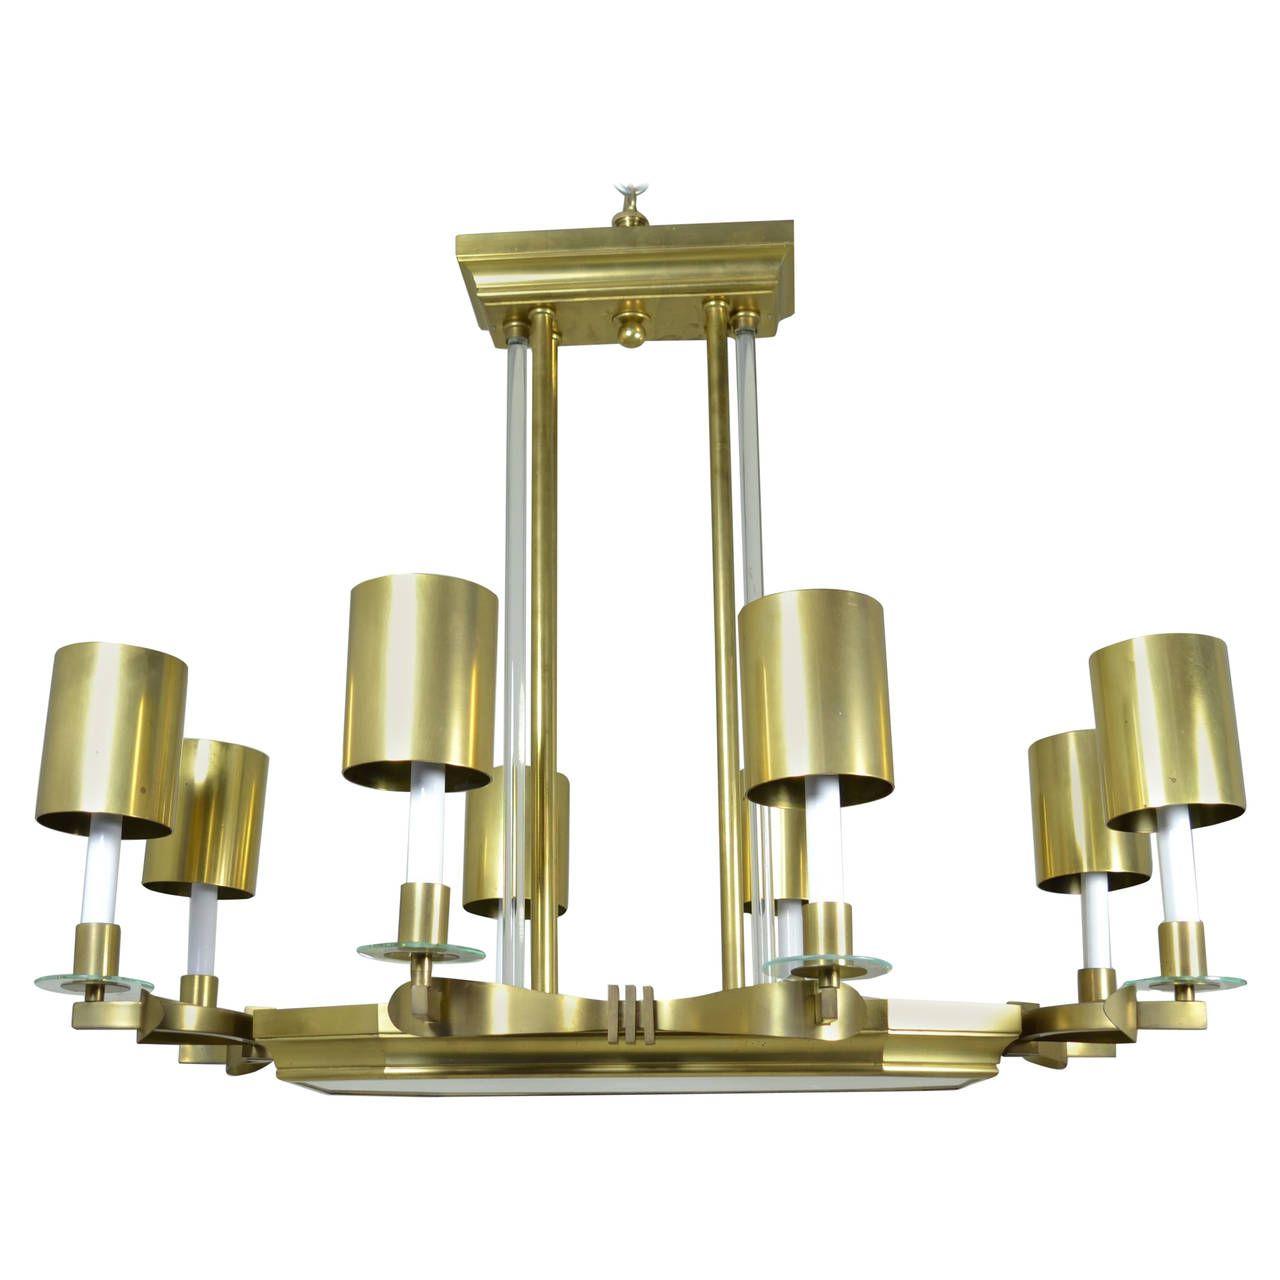 Large art deco style modernist chandelier